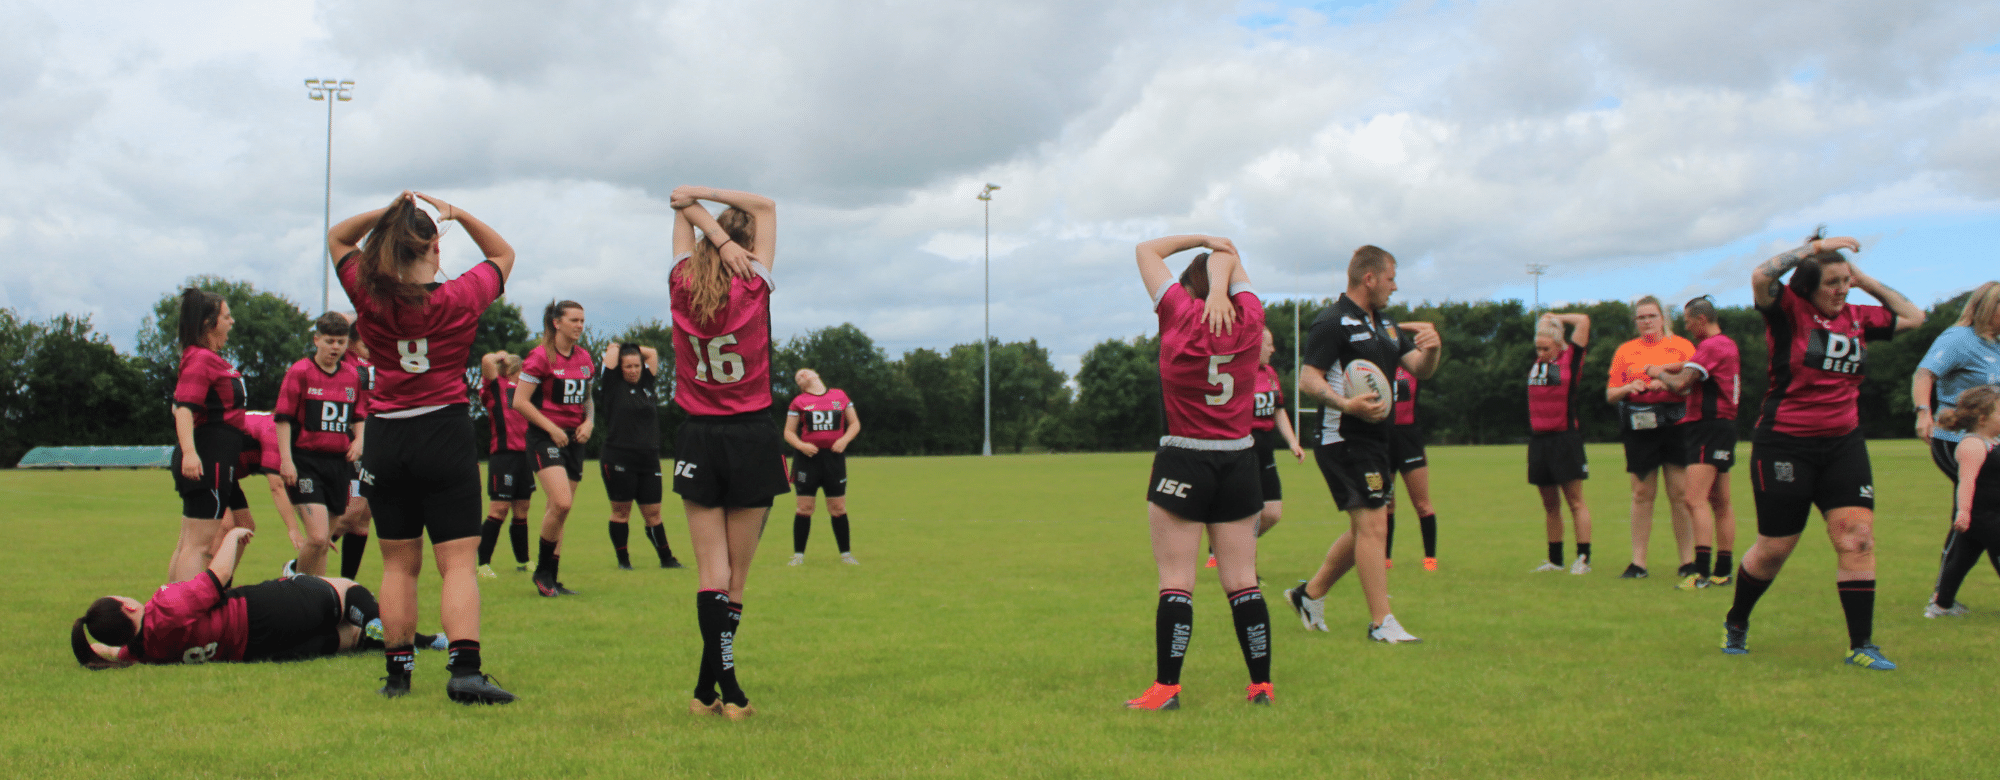 Girls Training Sessions Return Next Month